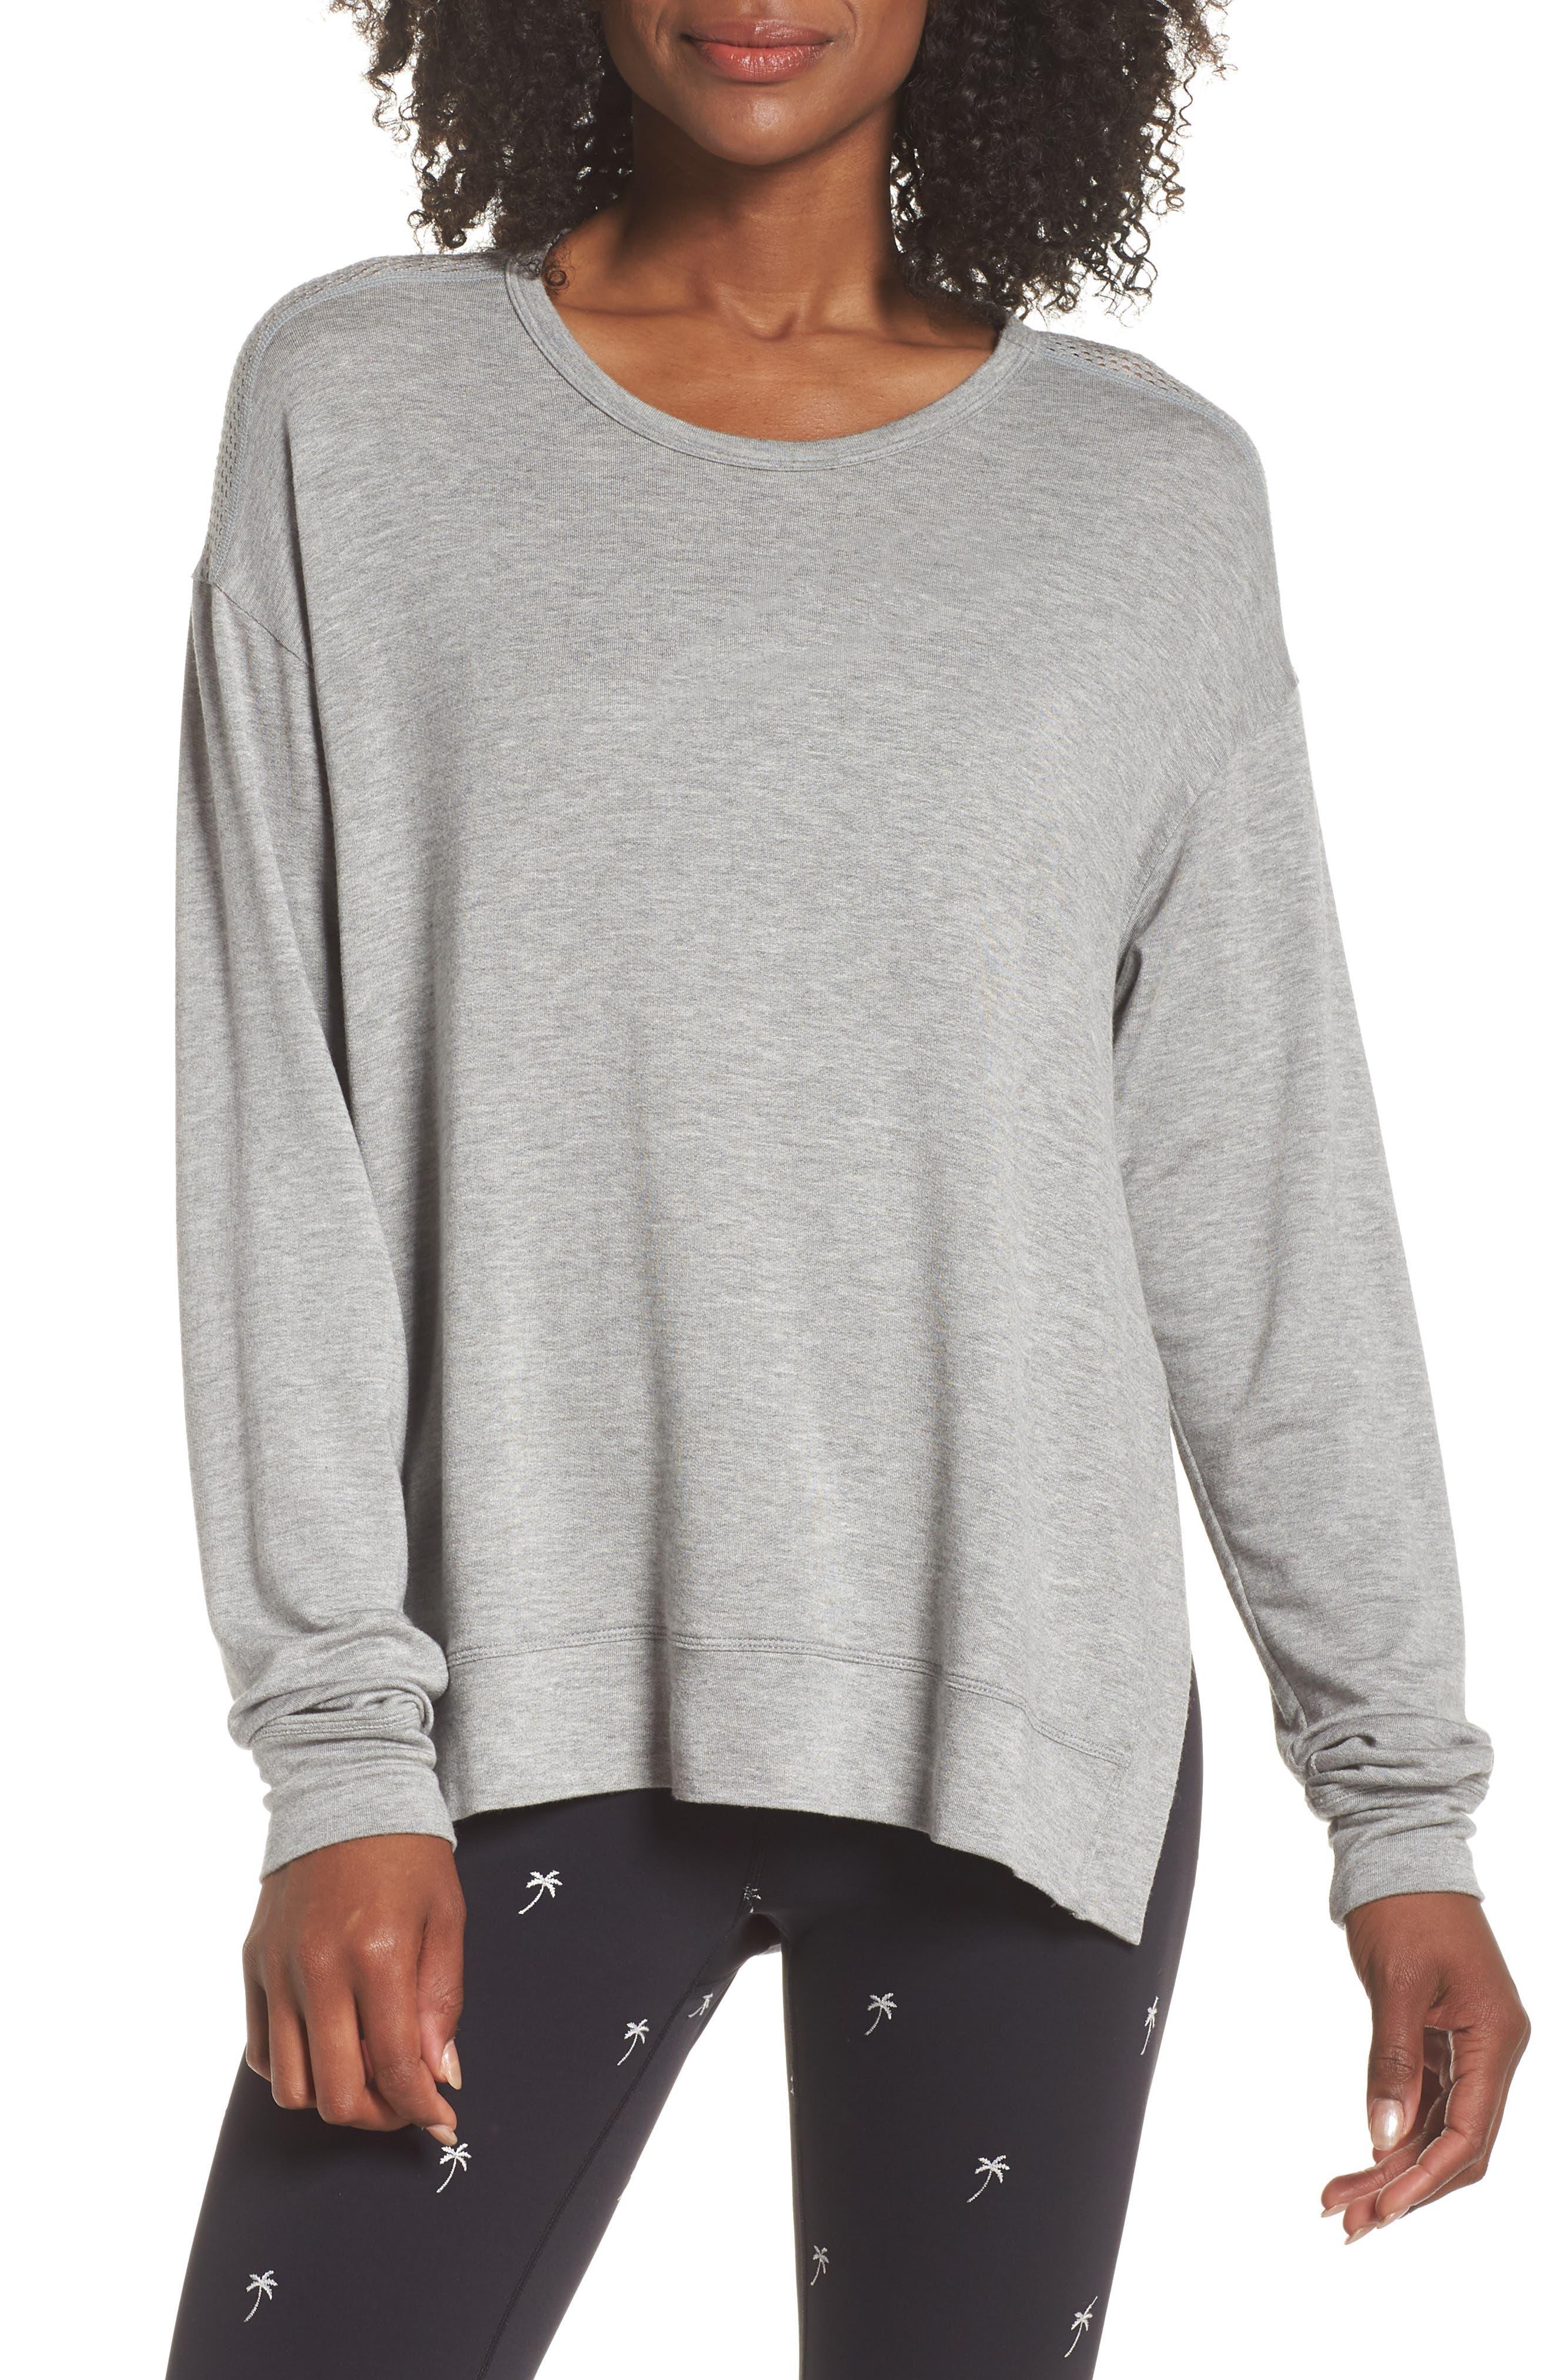 Heron Mesh Back Sweatshirt,                             Main thumbnail 1, color,                             HEATHER GREY